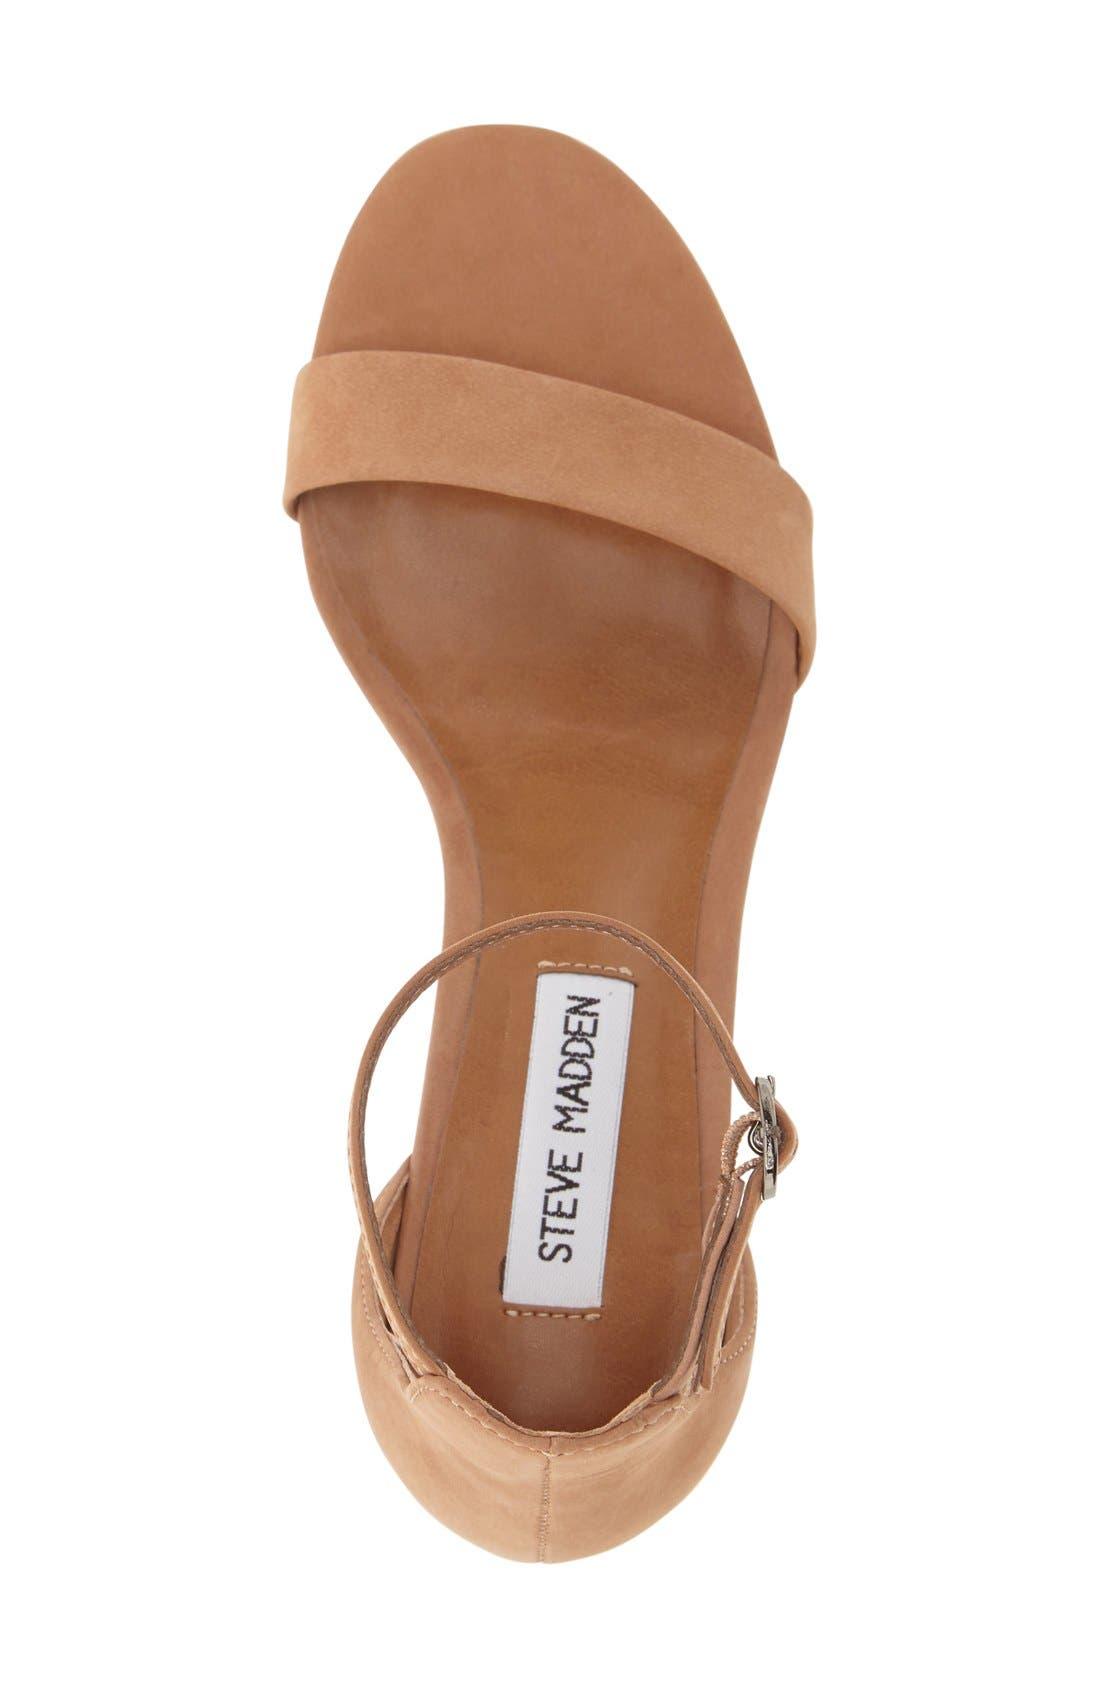 Irenee Ankle Strap Sandal,                             Alternate thumbnail 3, color,                             Tan Nubuck